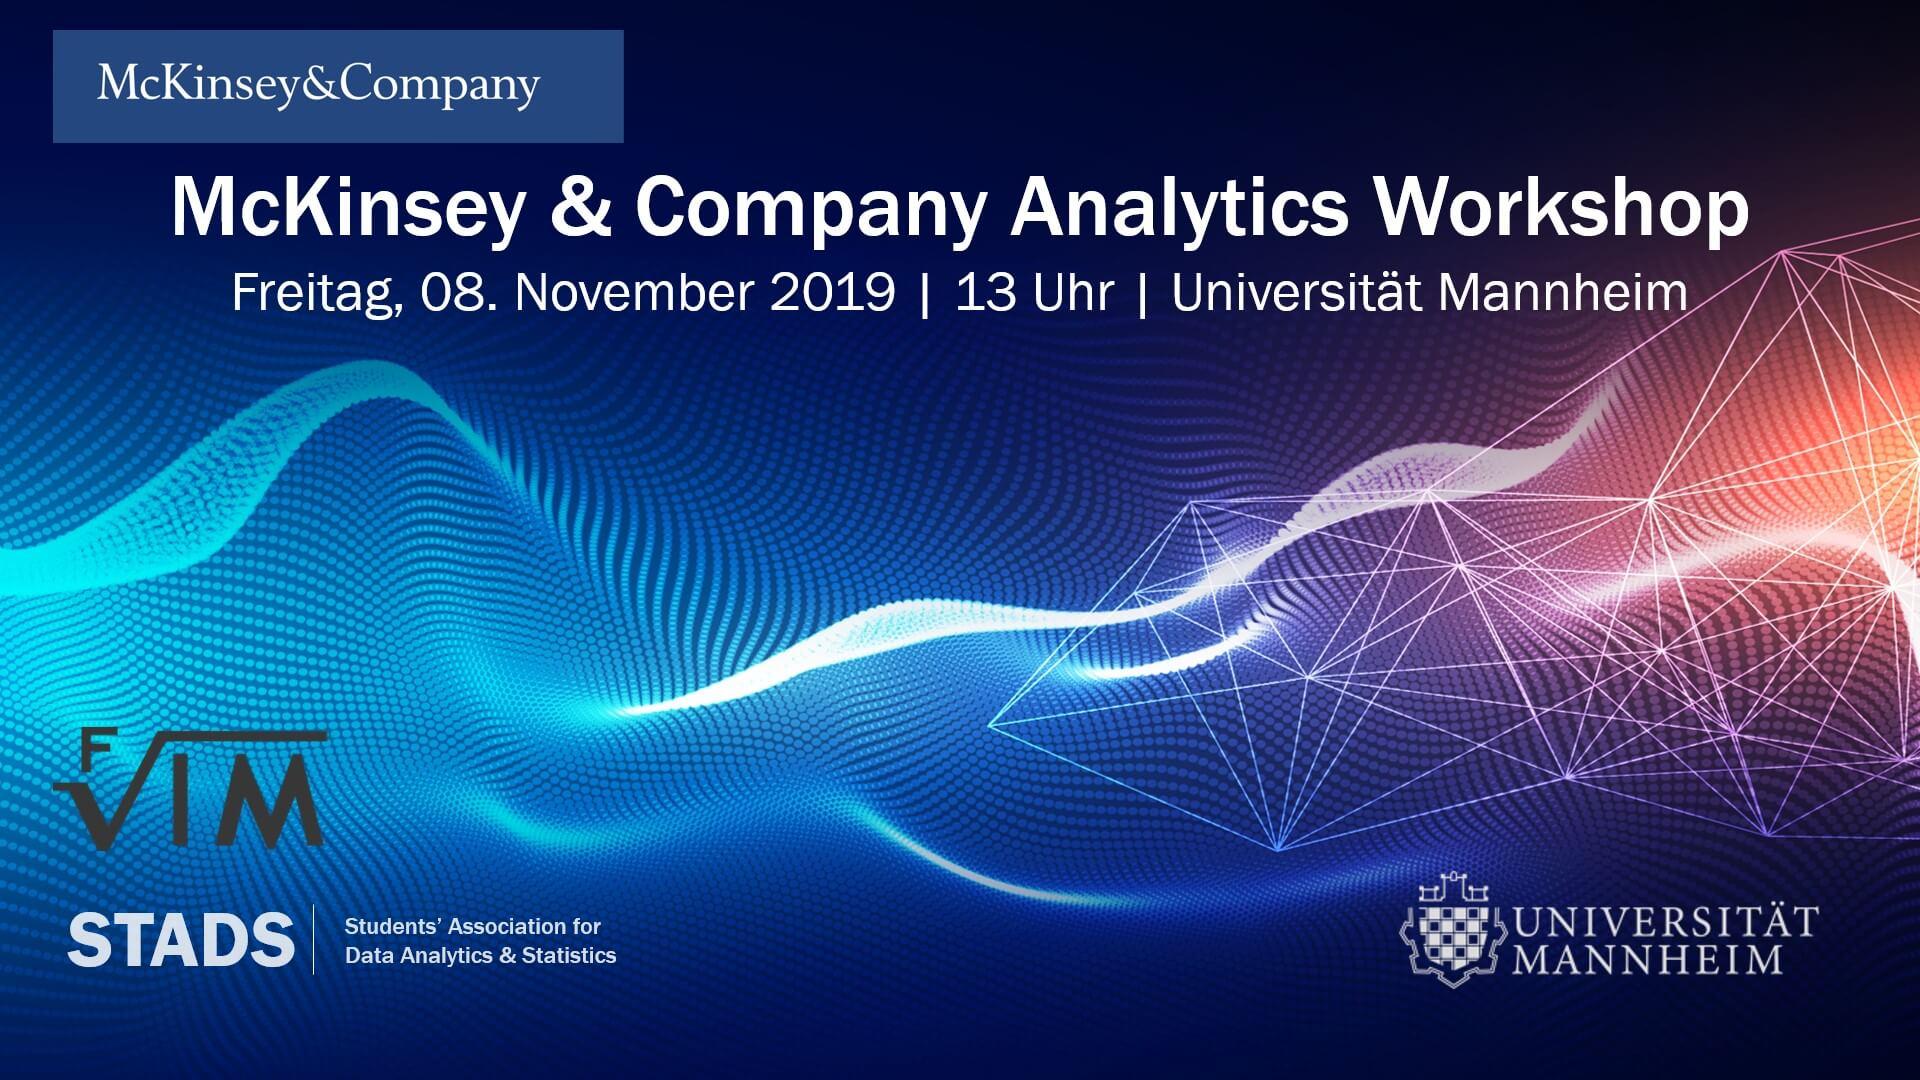 McKinsey & Company Analytics Workshop